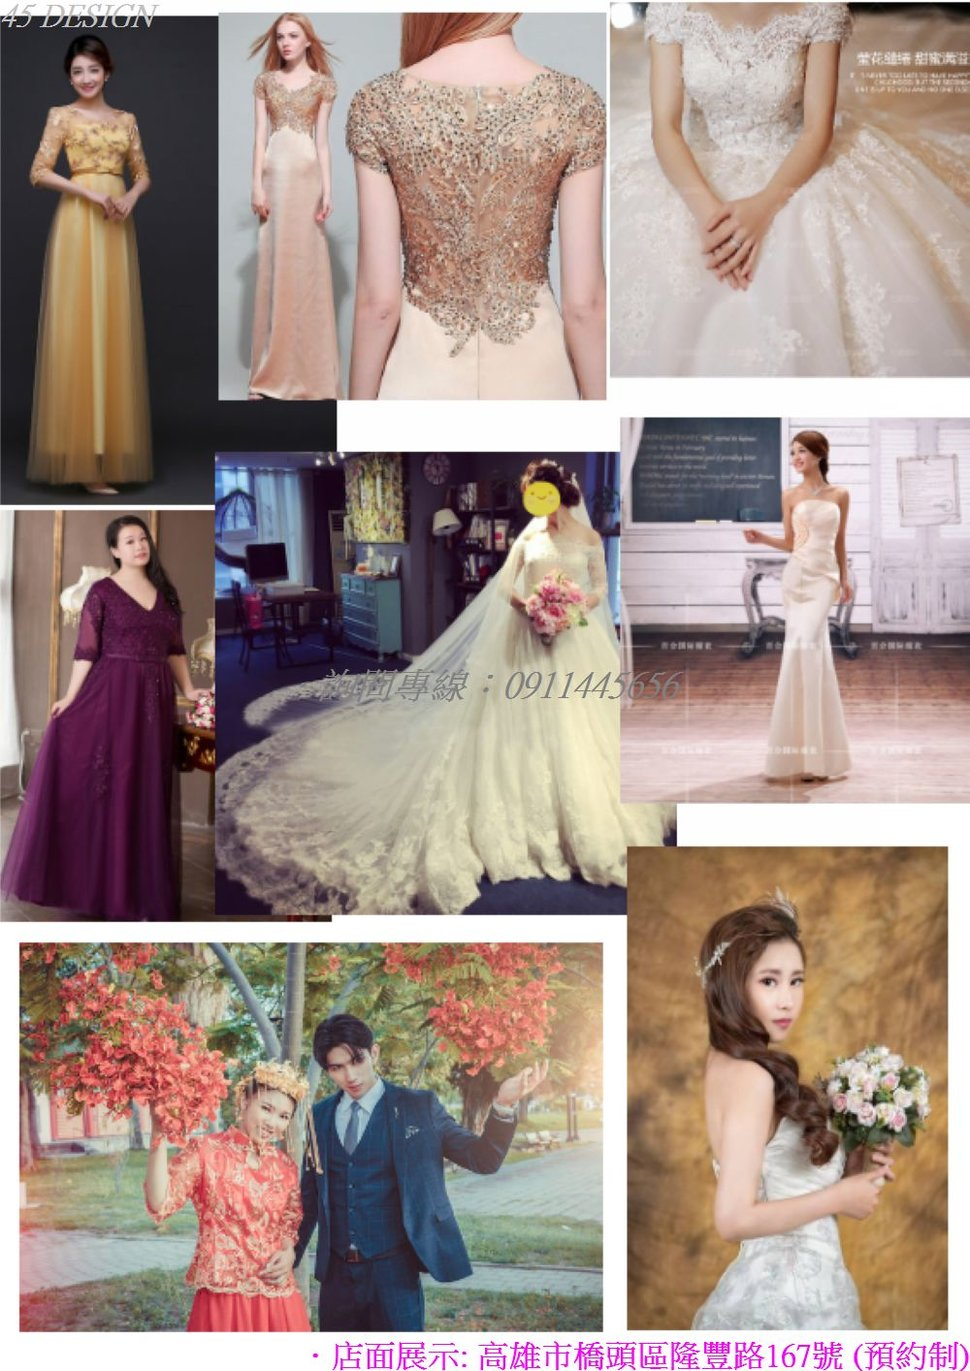 msl19081592A547C86C954389B1484A32CFDB8FBF - 全台最便宜-45DESIGN四五婚紗禮服《結婚吧》